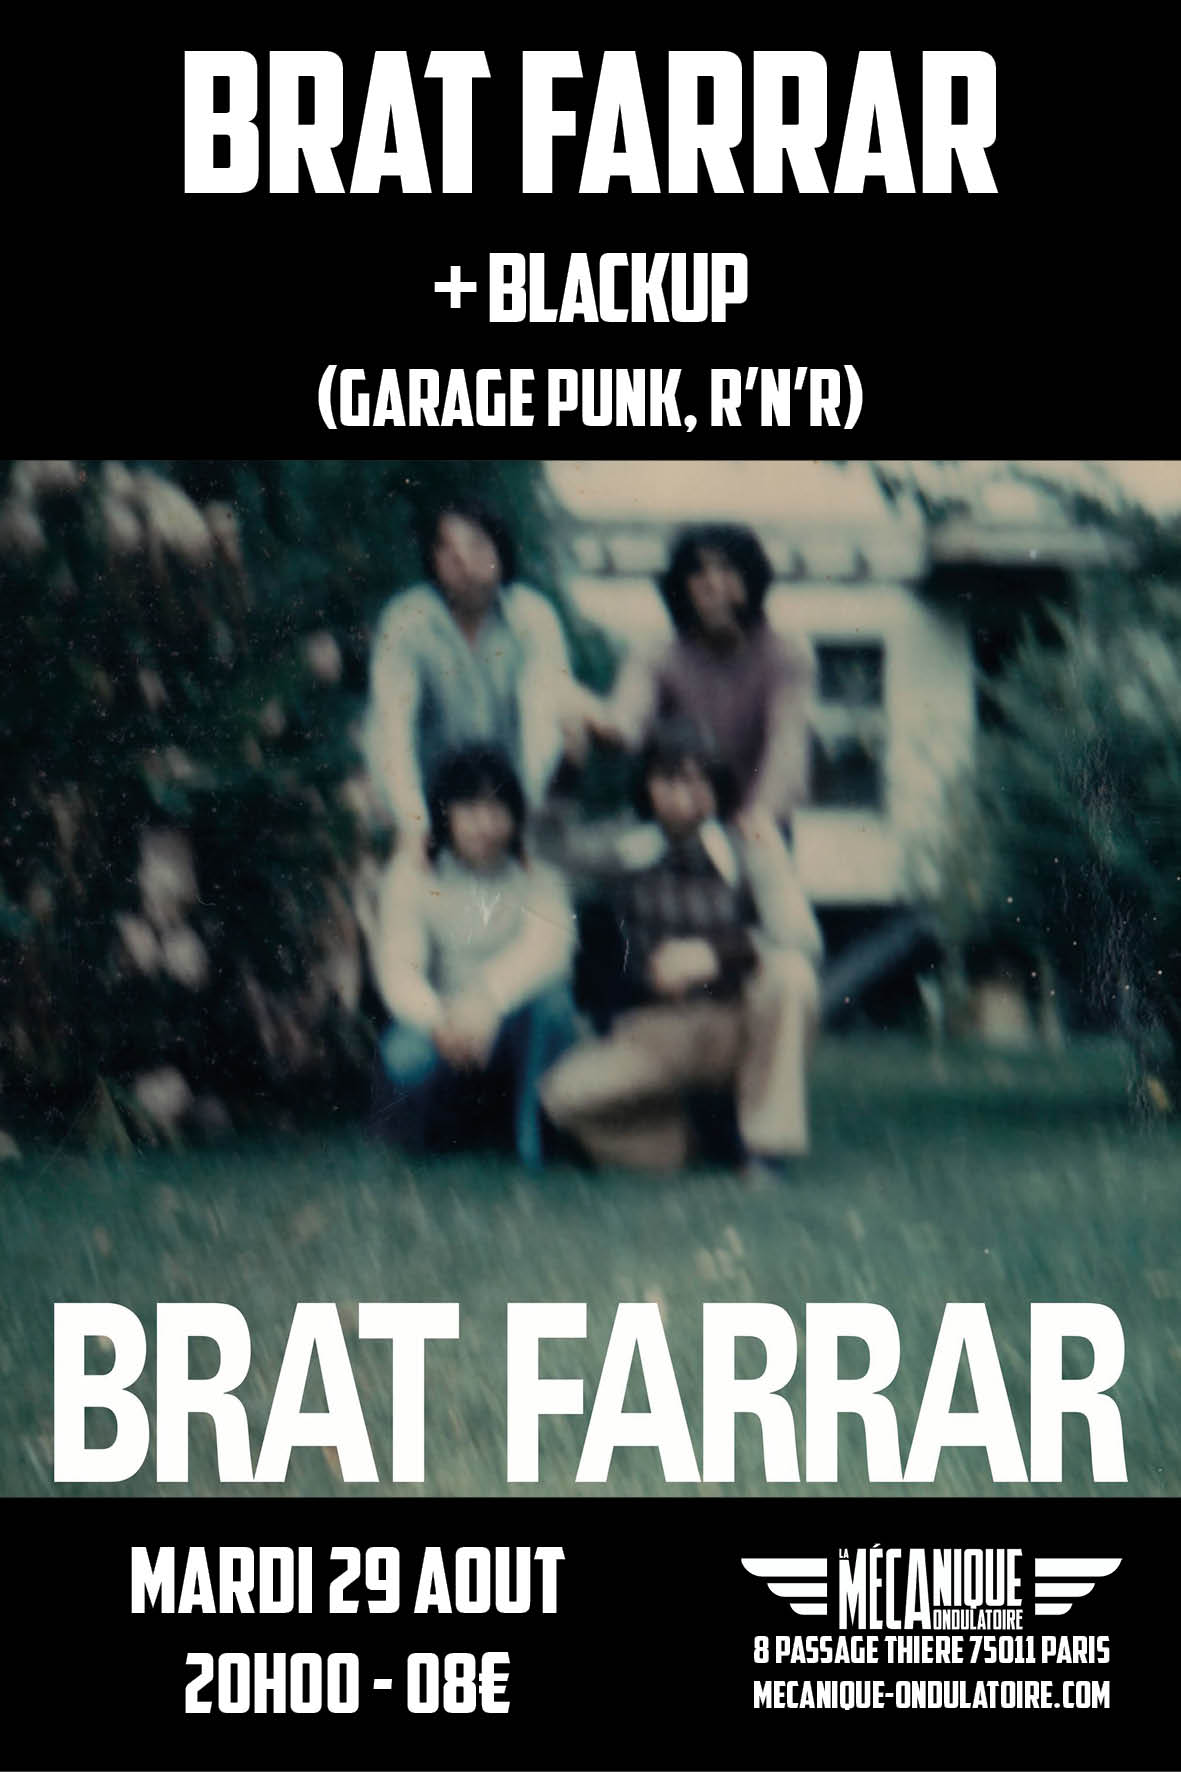 BRAT FARRAR + Blackup // 29.08